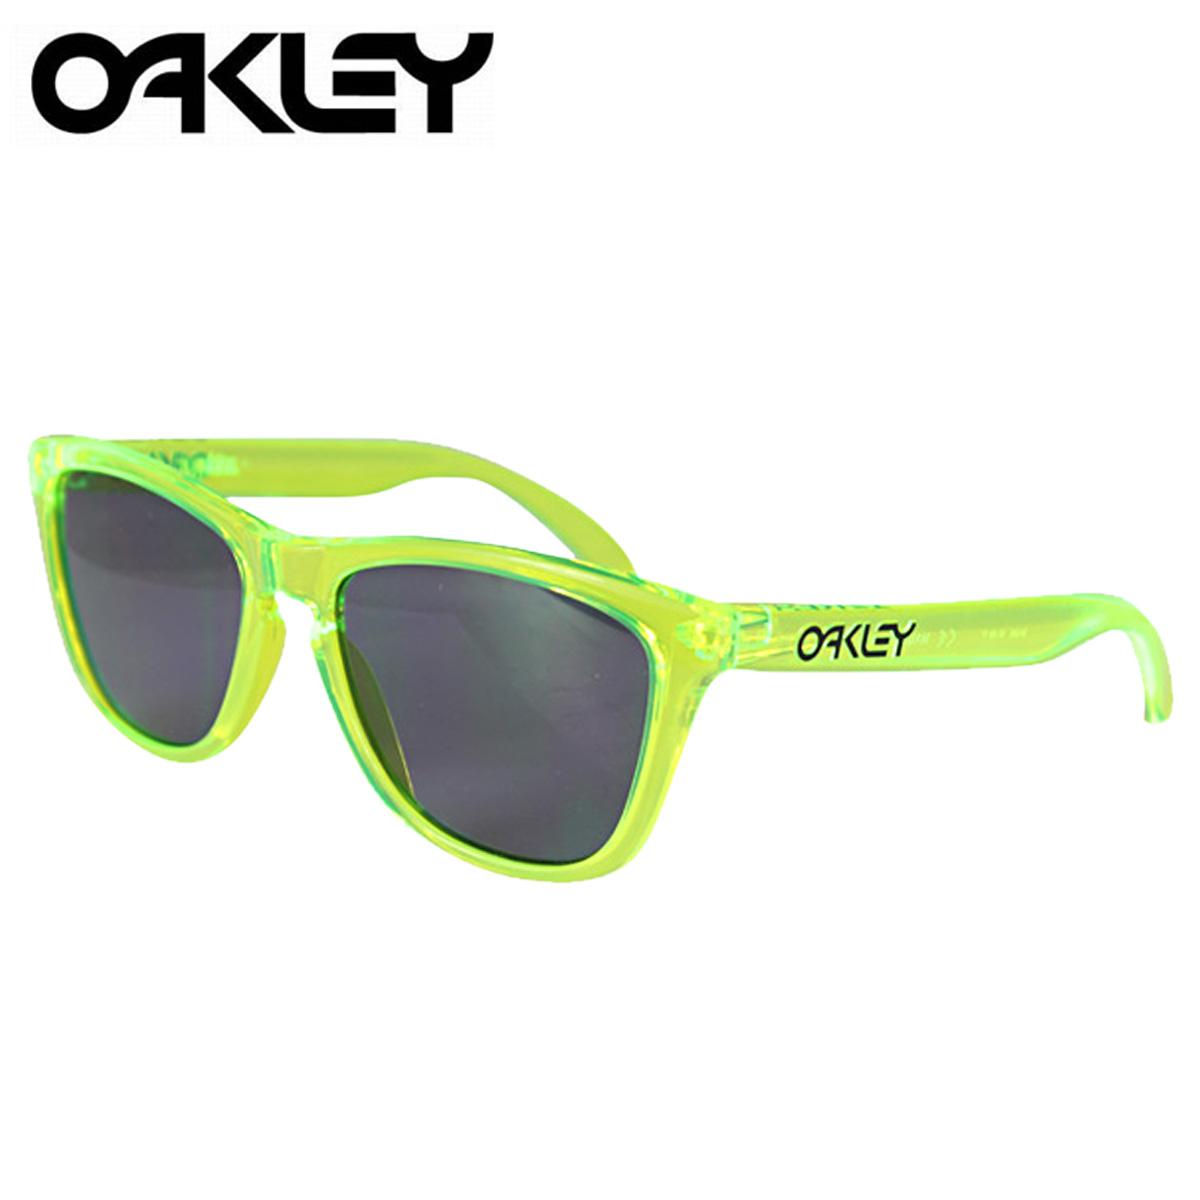 3159983a262b ... shop whats up sports rakuten global market sold out oakley oakley  sunglasses frogskins frog skin glasses